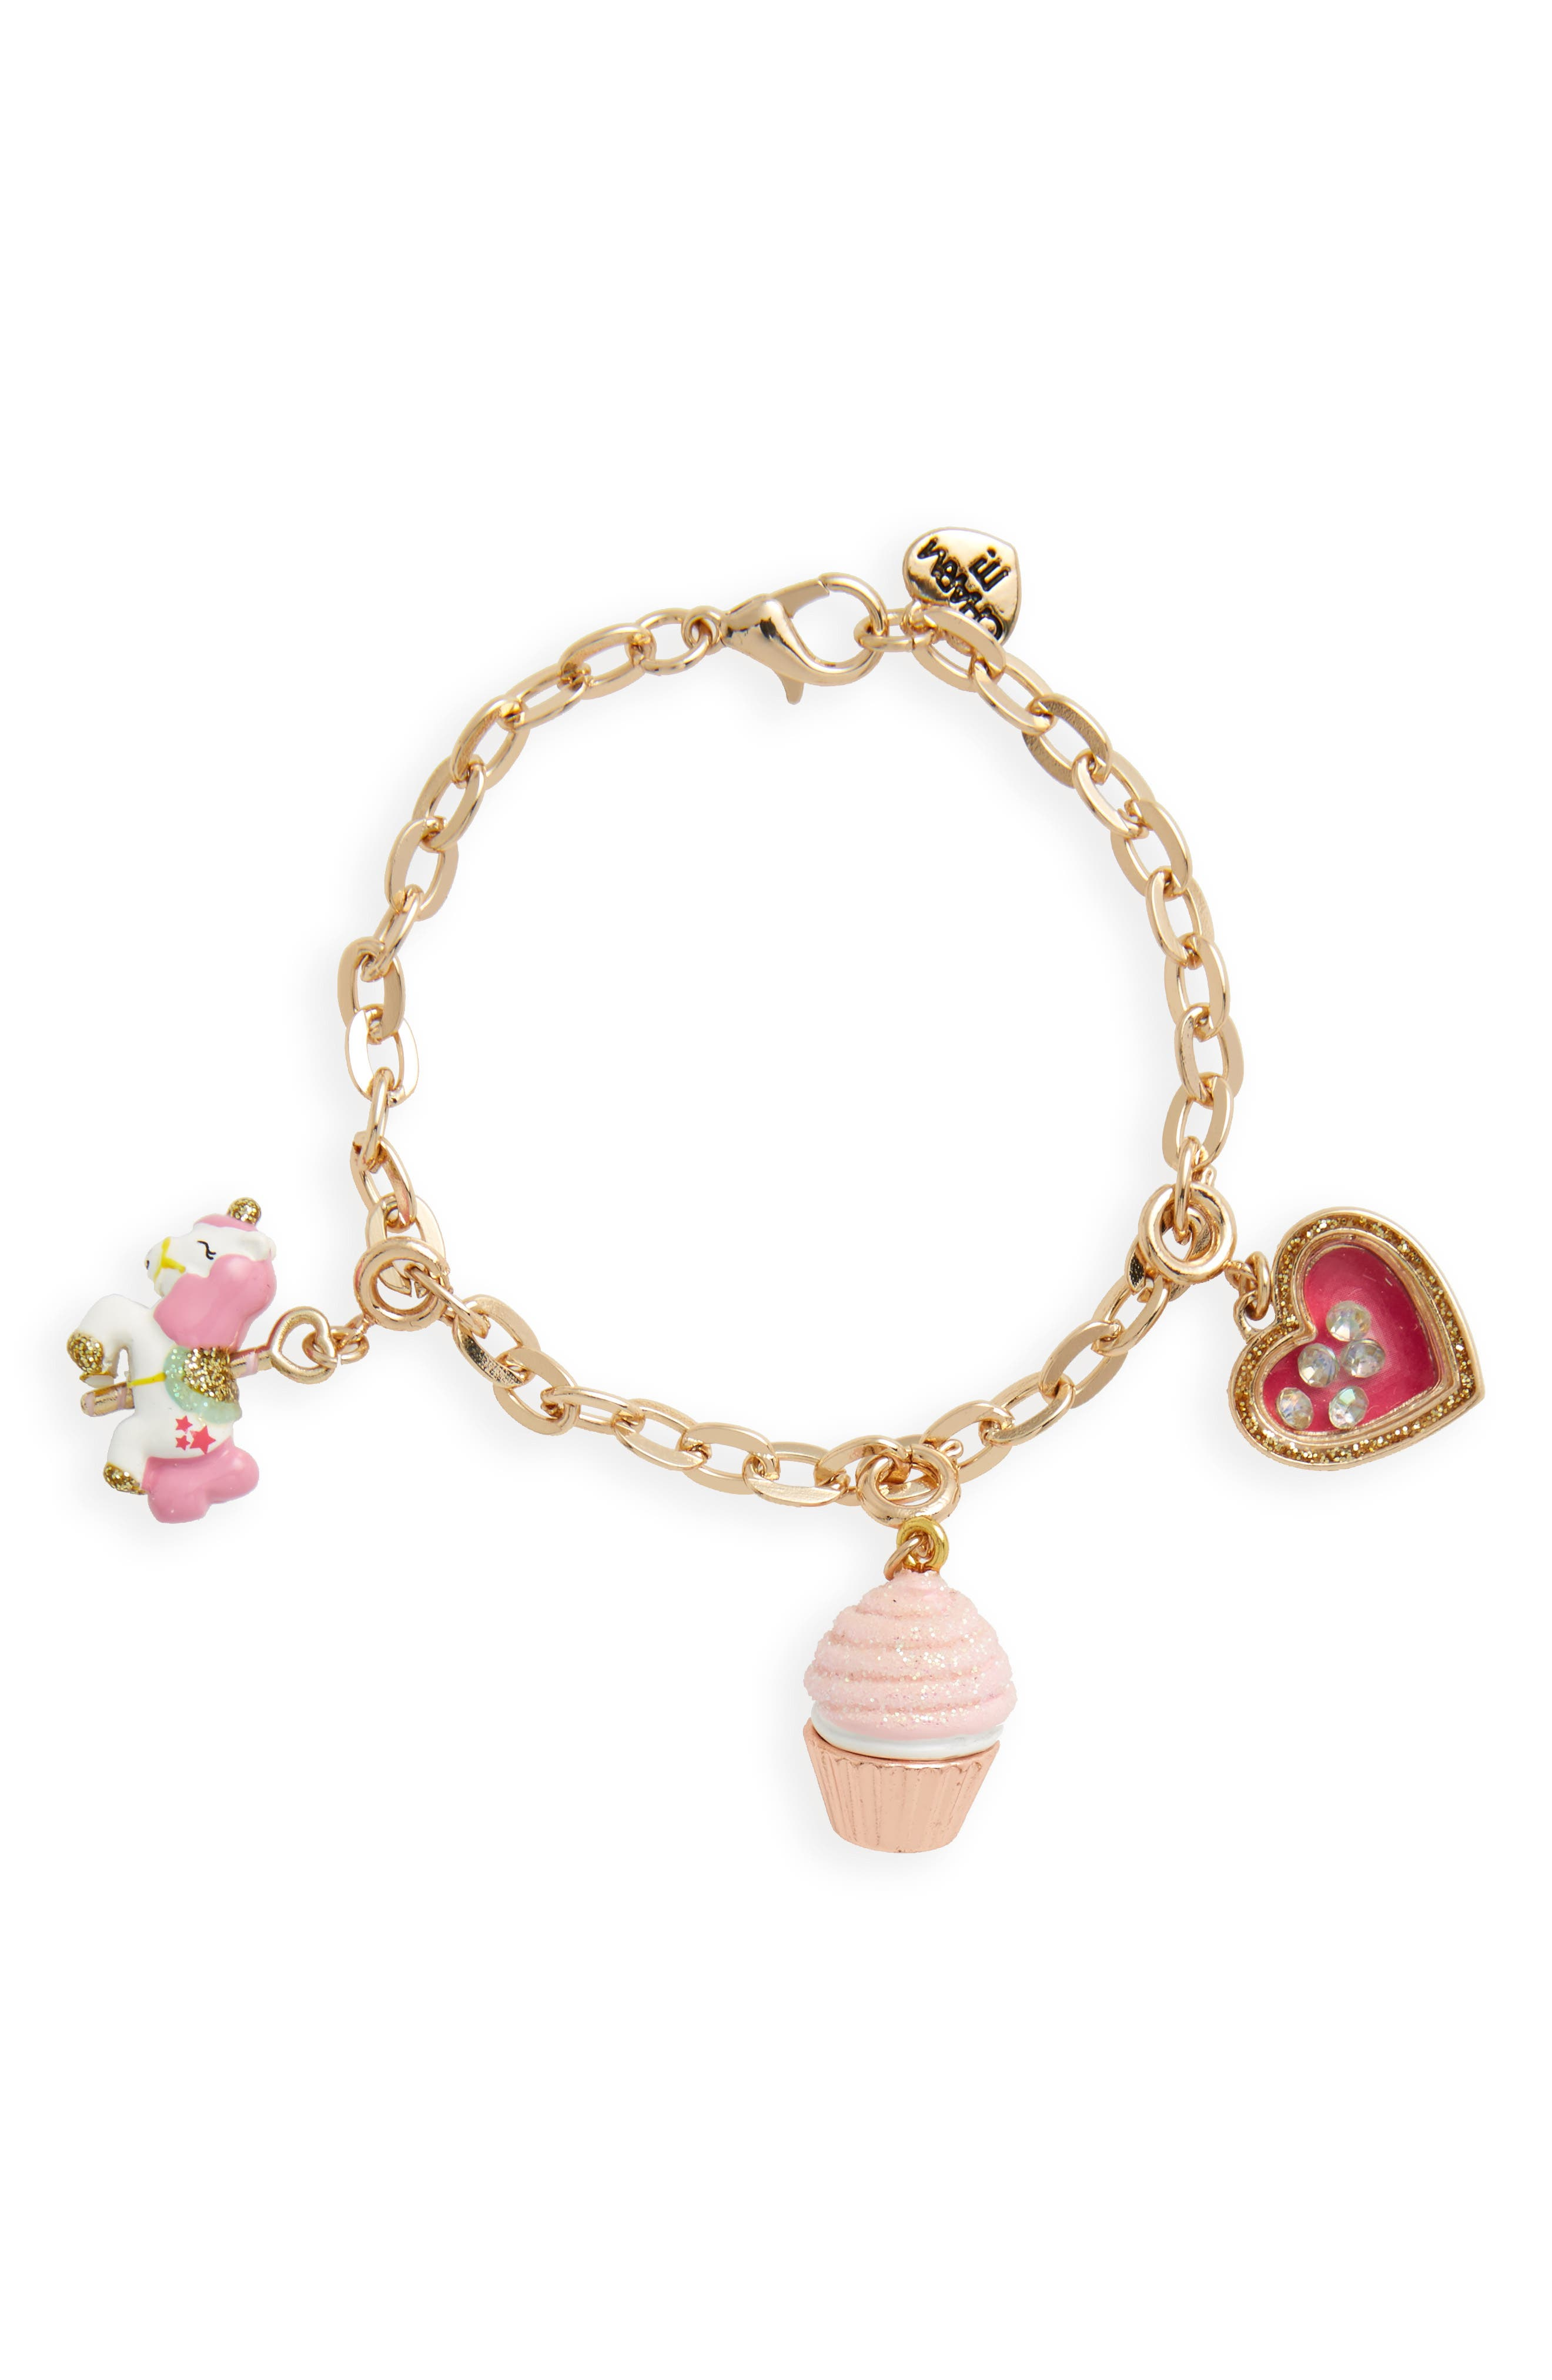 Sweet Magical Charm Bracelet Set,                         Main,                         color, Gold/ Pink/ White